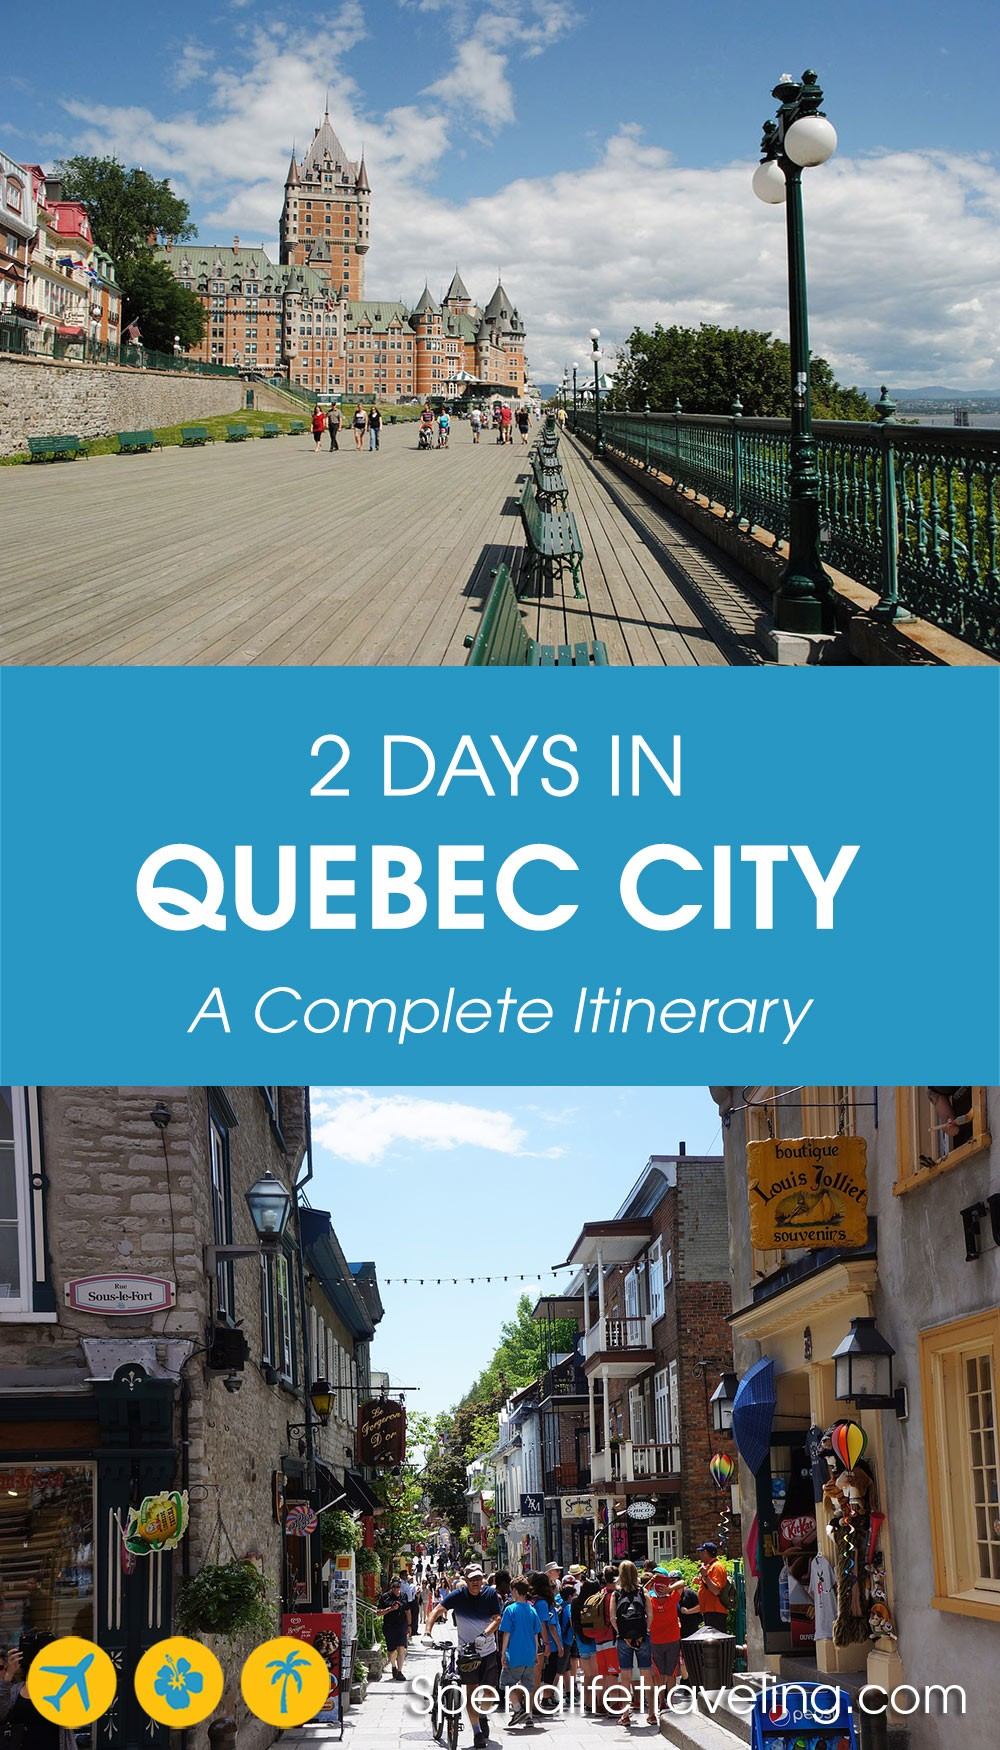 2 days in Quebec City, Canada